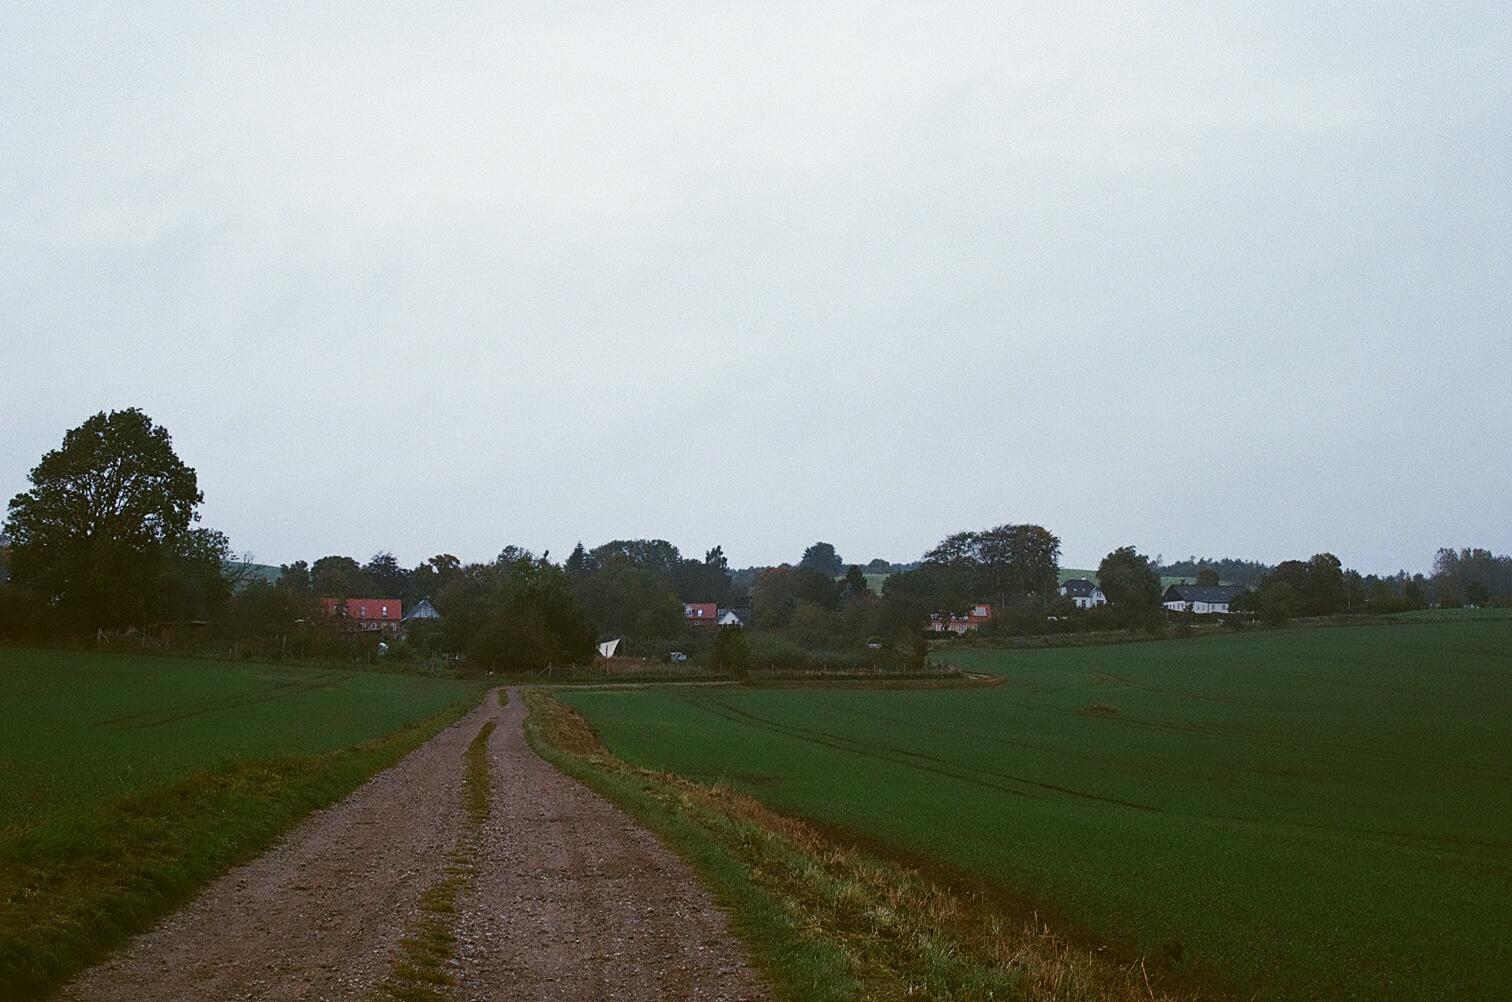 Marslet, Aarhus, Denmark